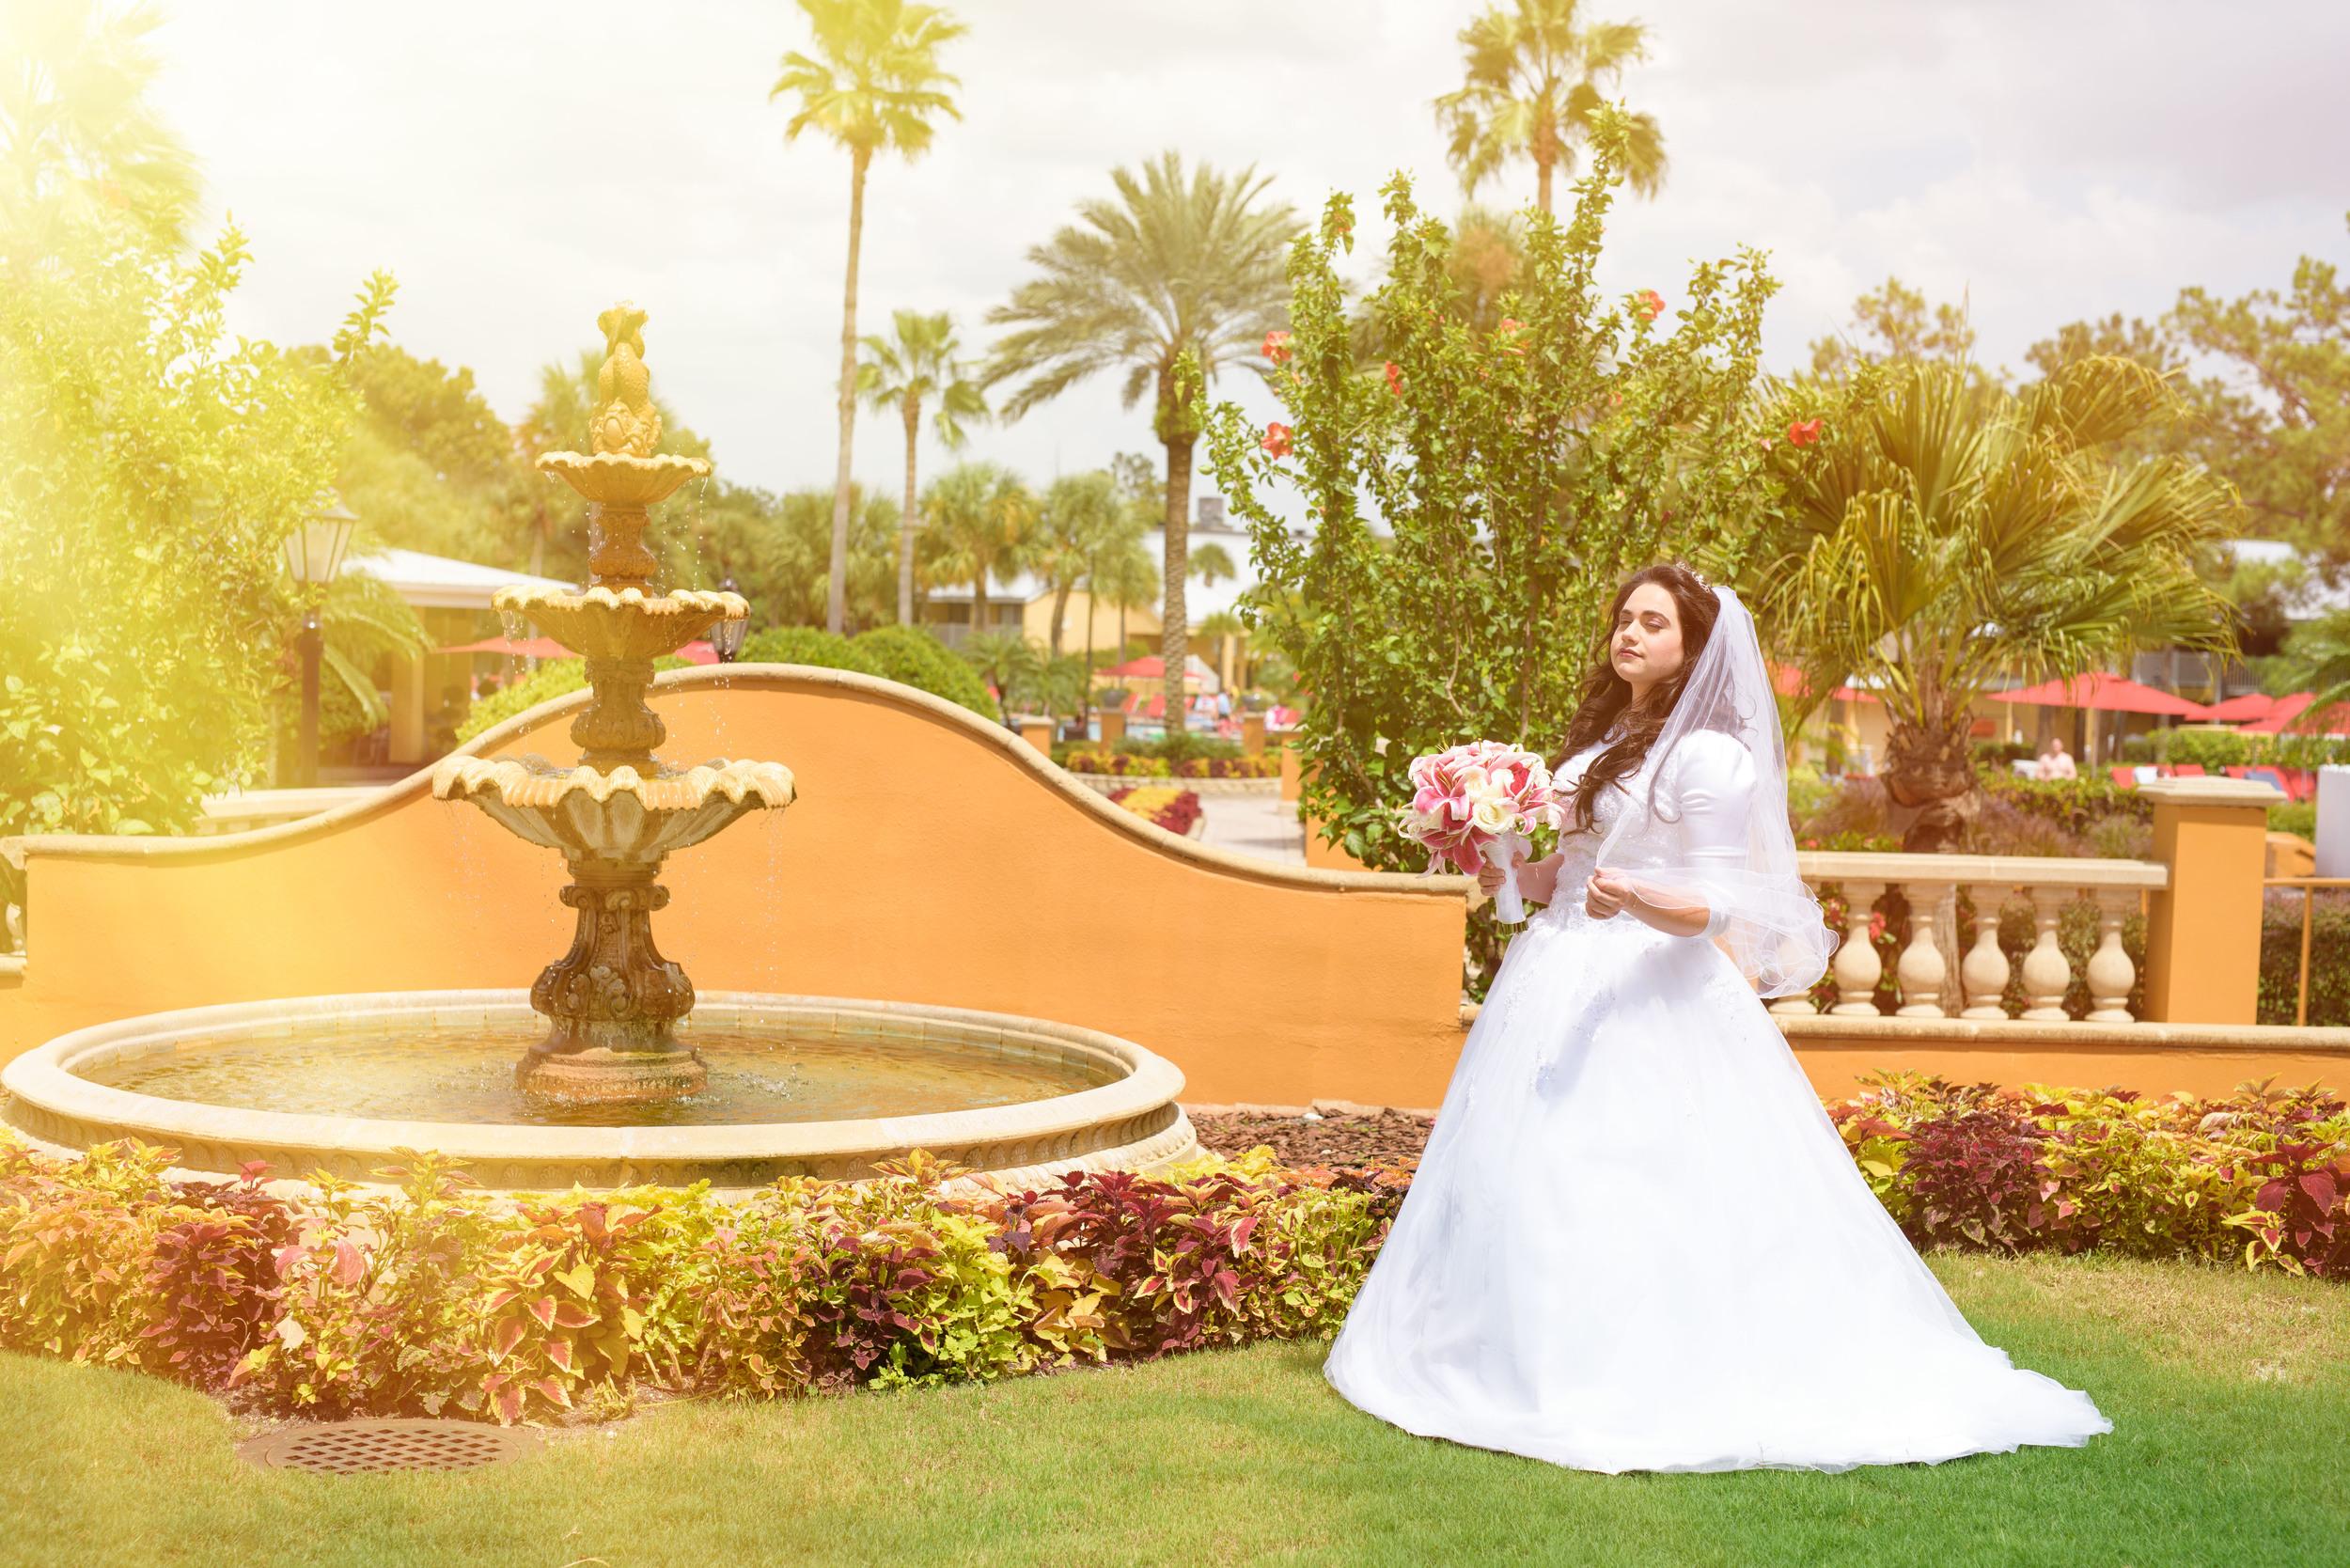 Wedding by Levikfoto.com-056.jpg